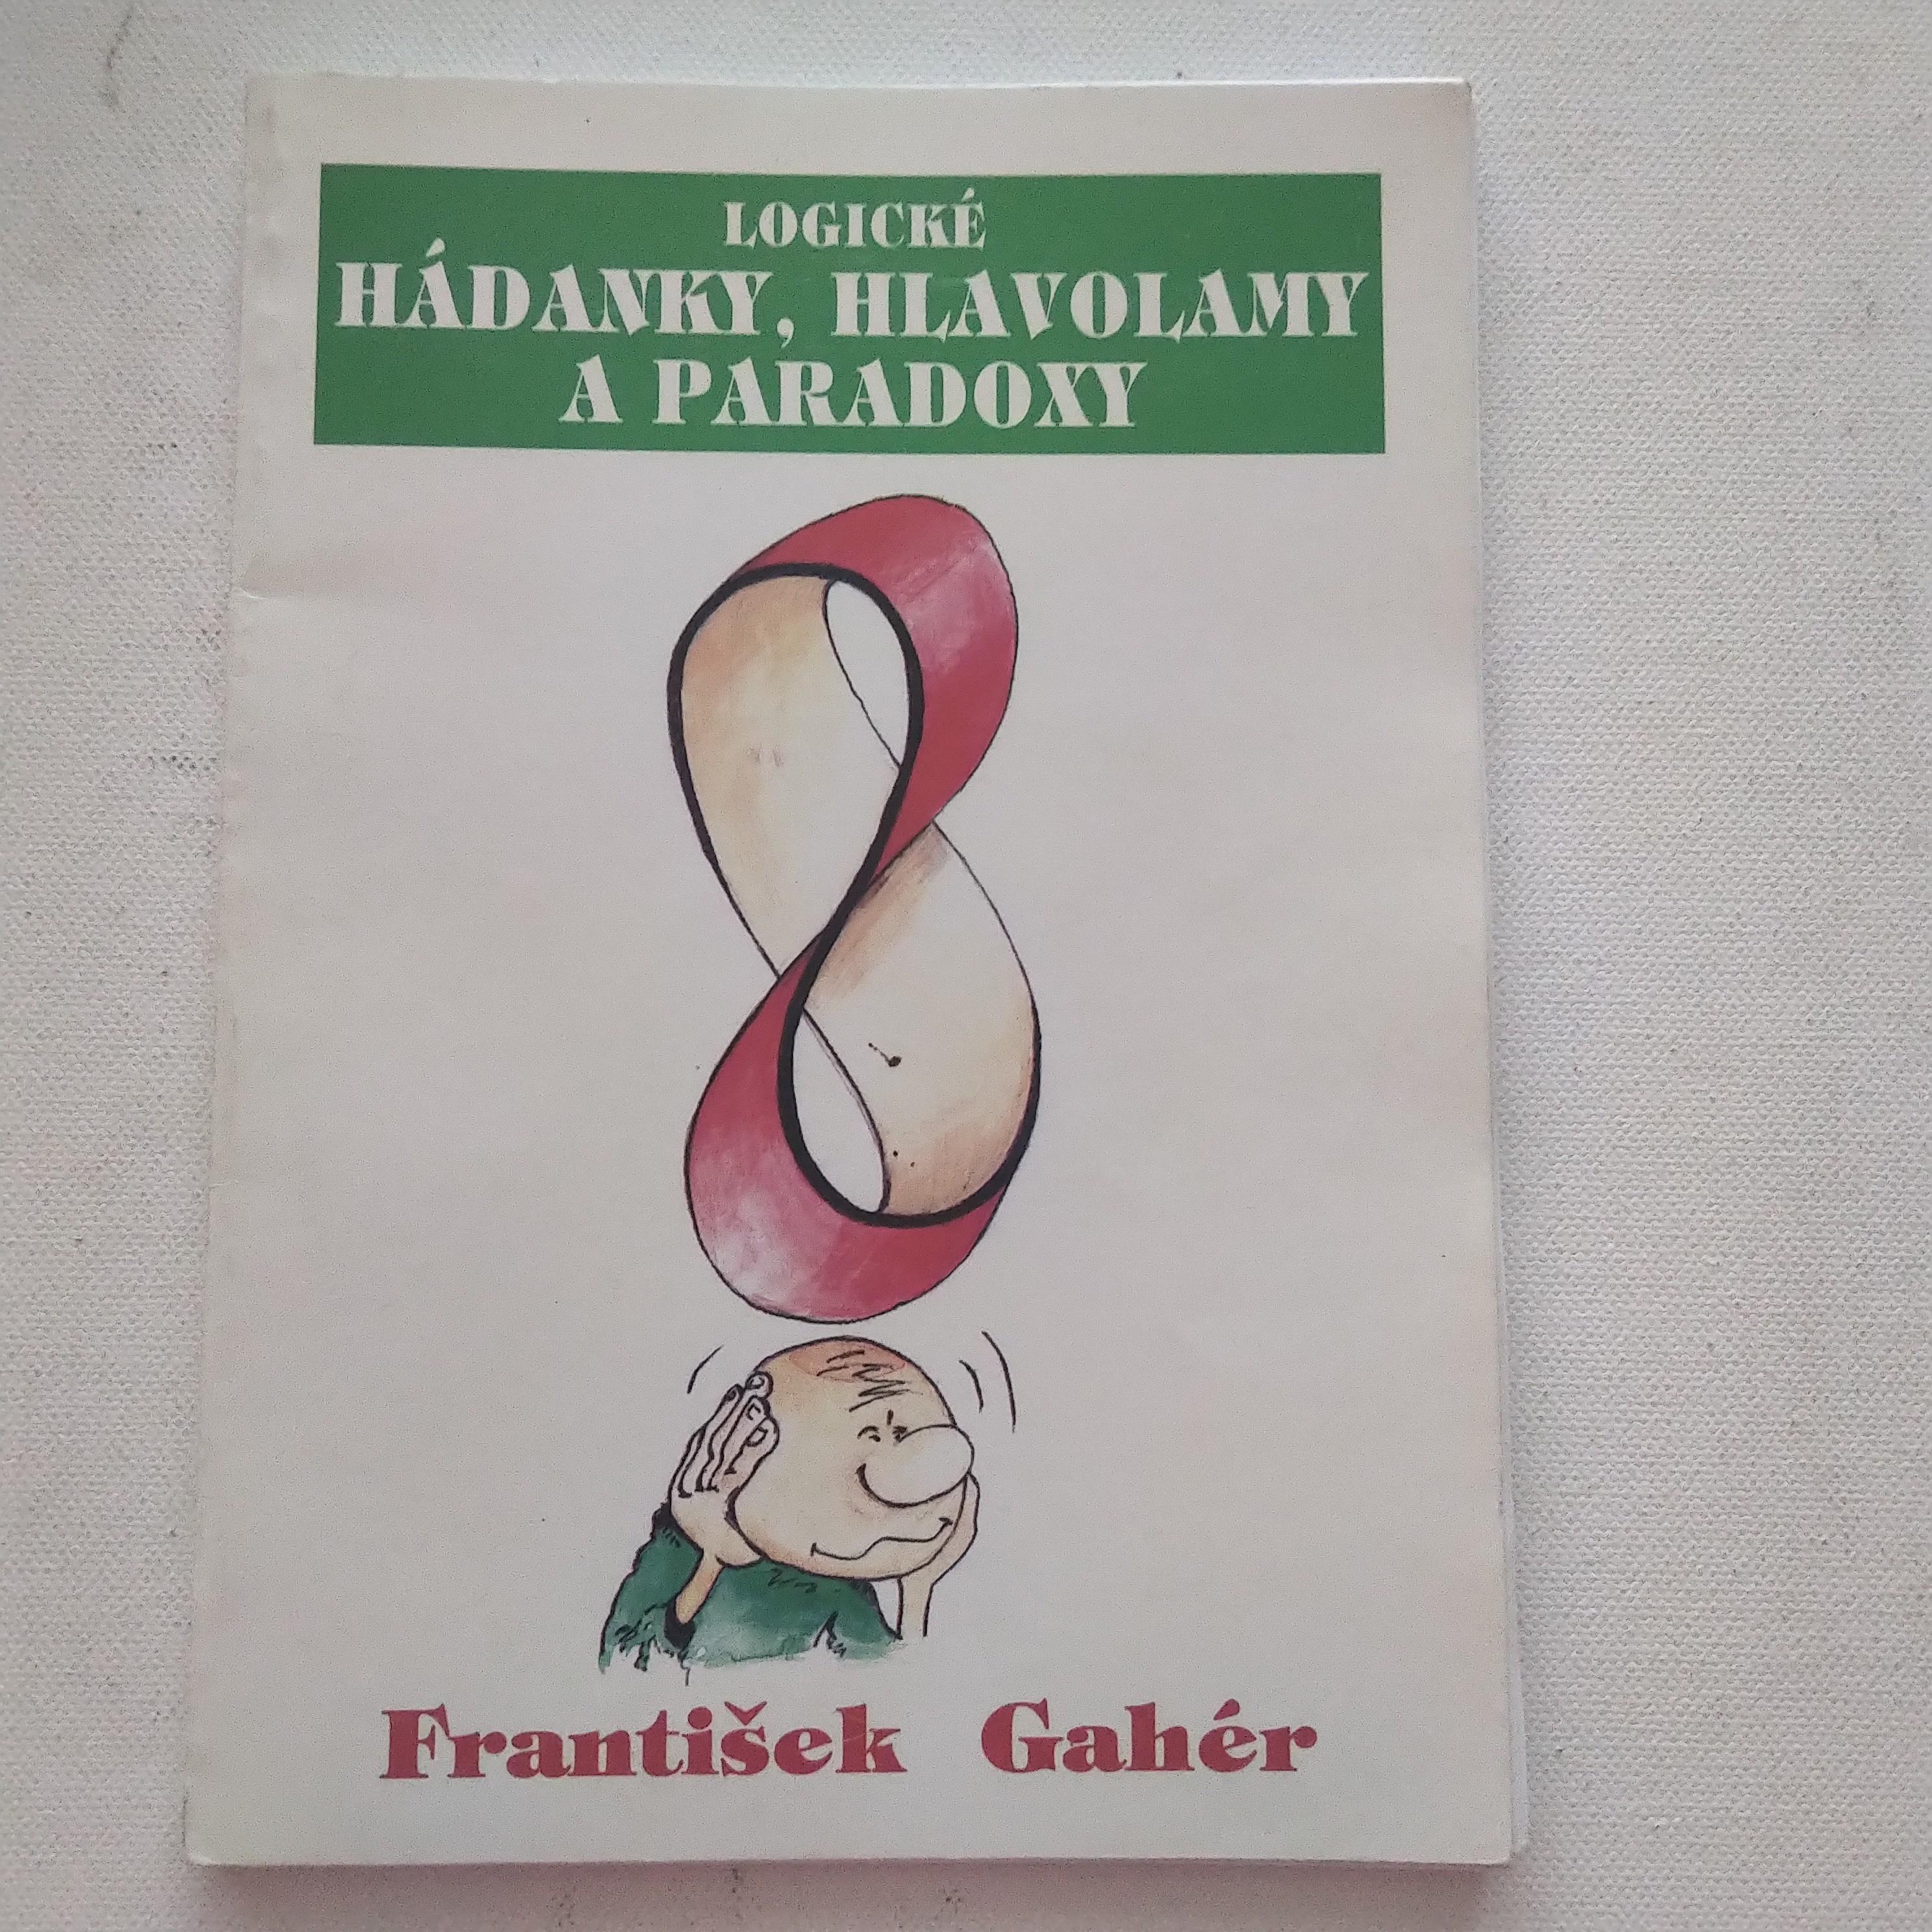 b931bfab1 Logické hádanky, hlavolamy a paradoxy